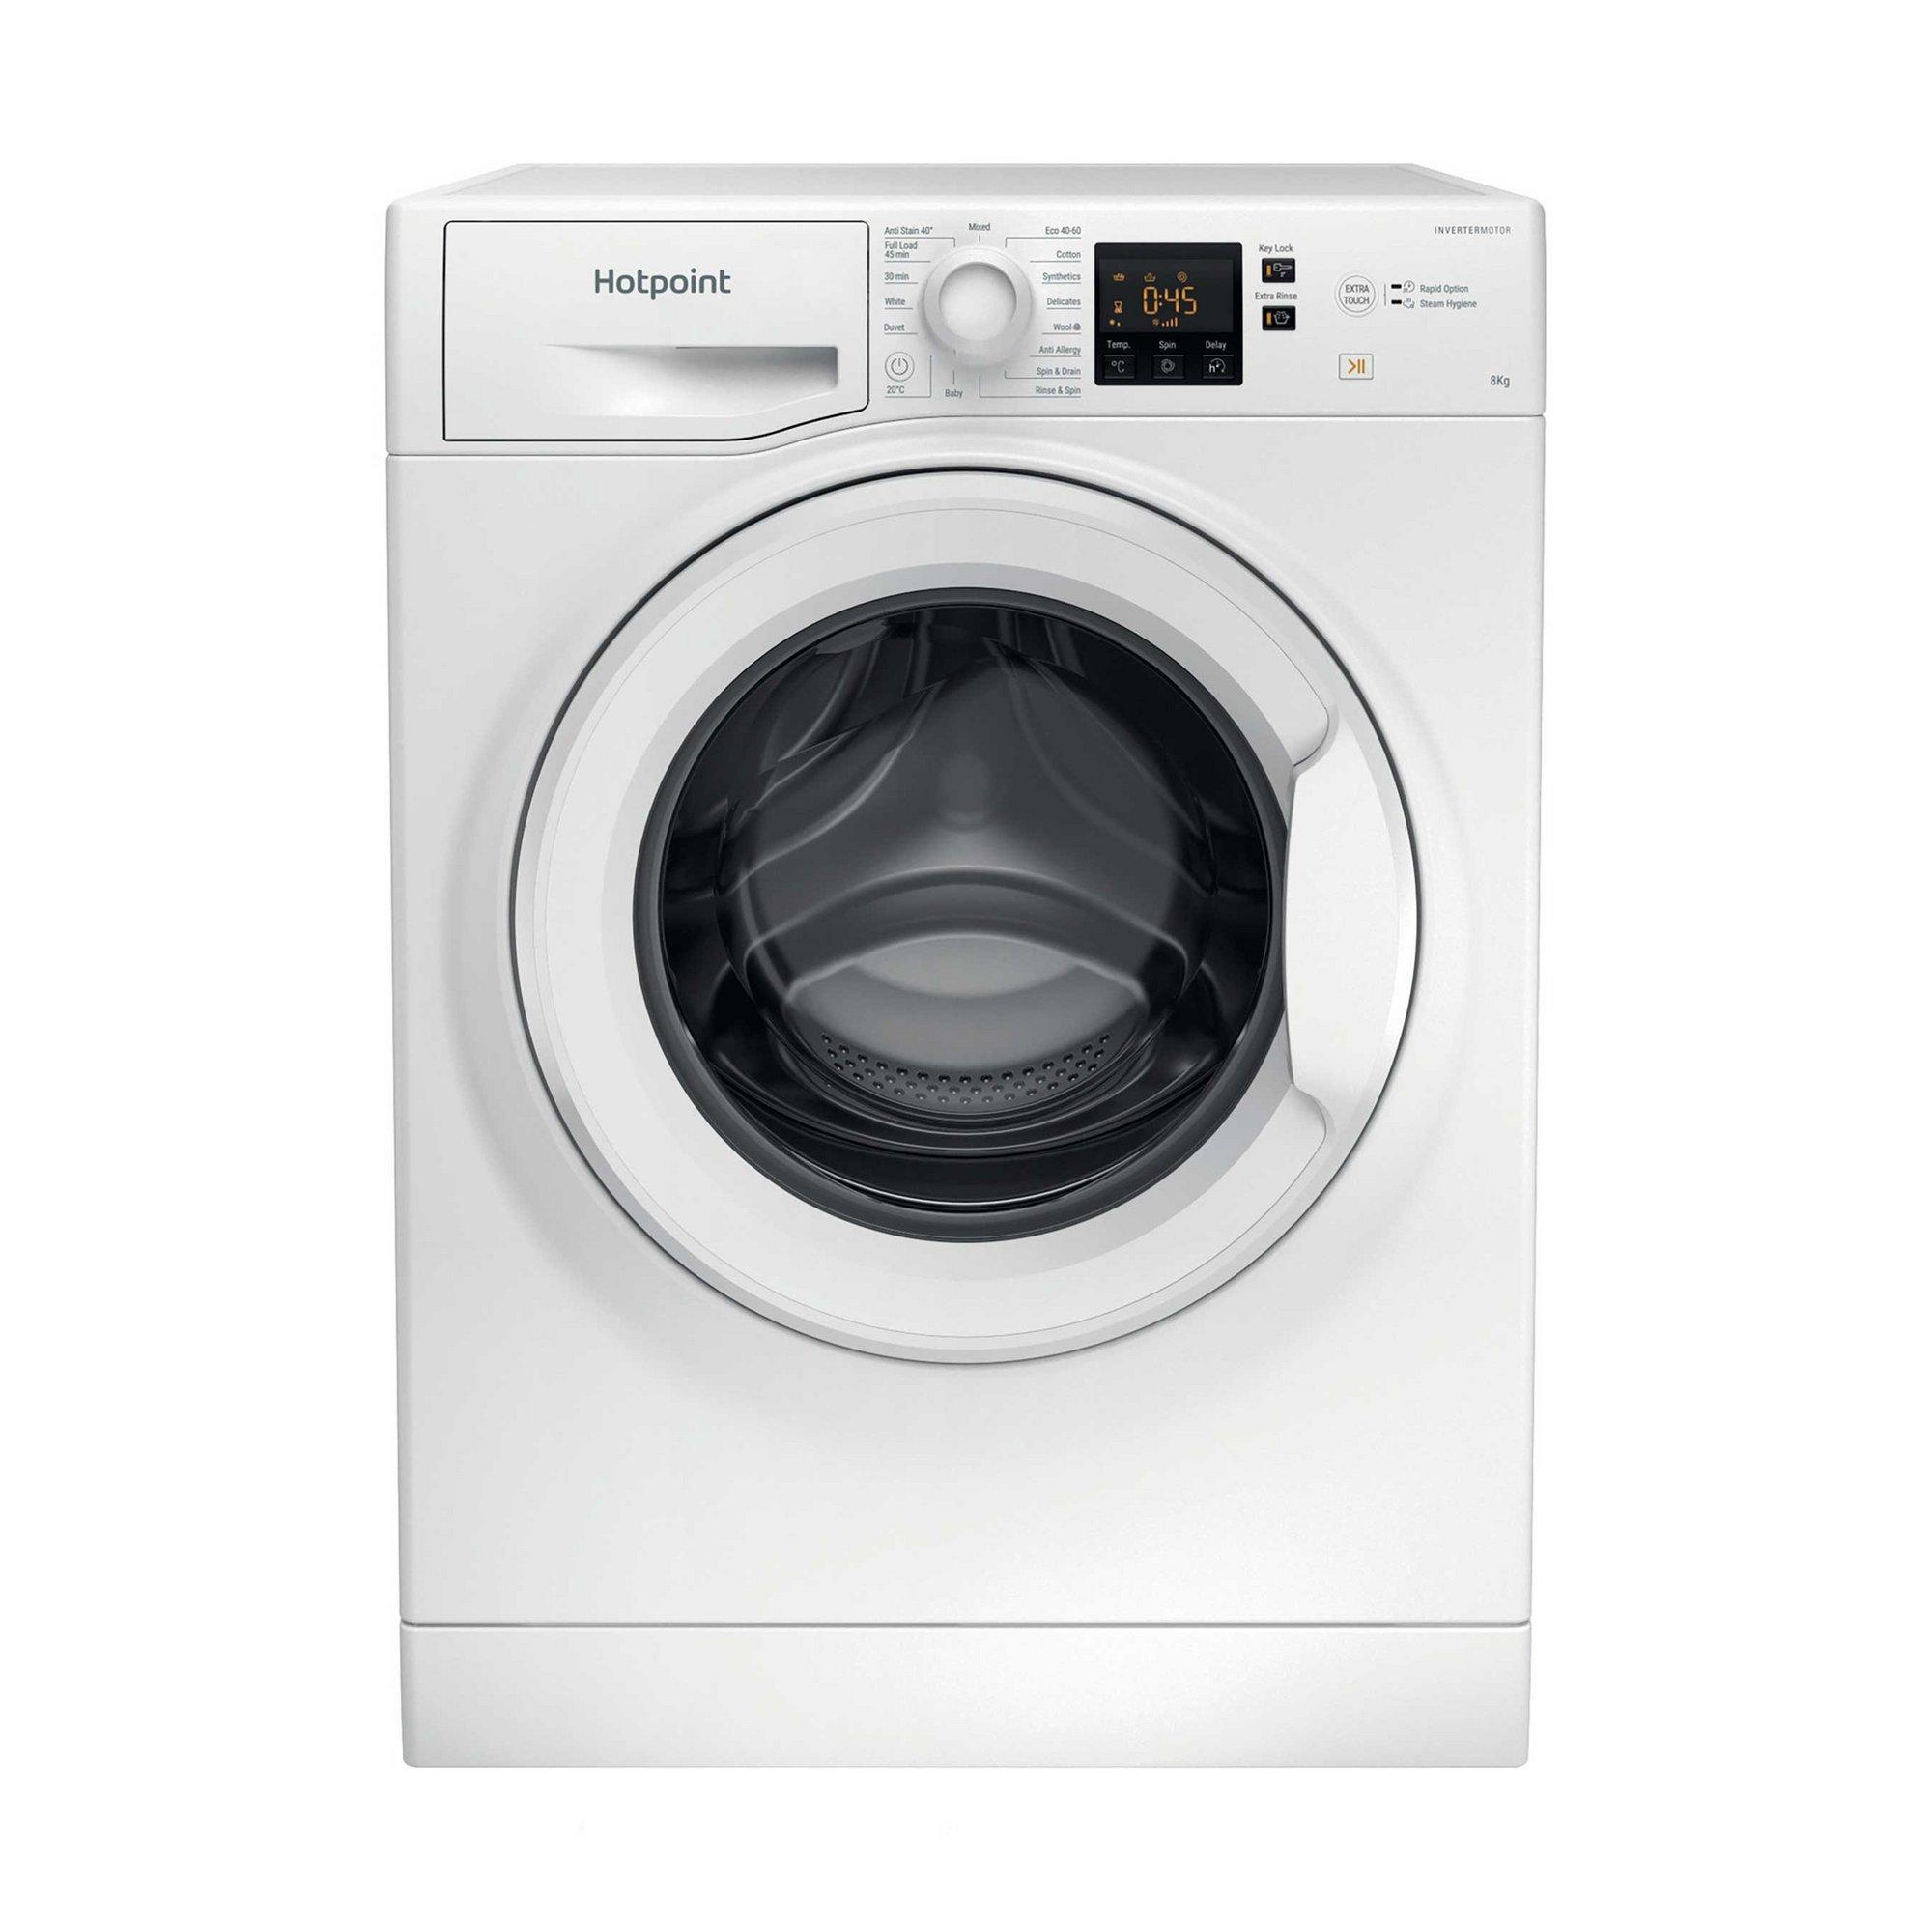 Image of Hotpoint 8kg 1400 Spin Washing Machine